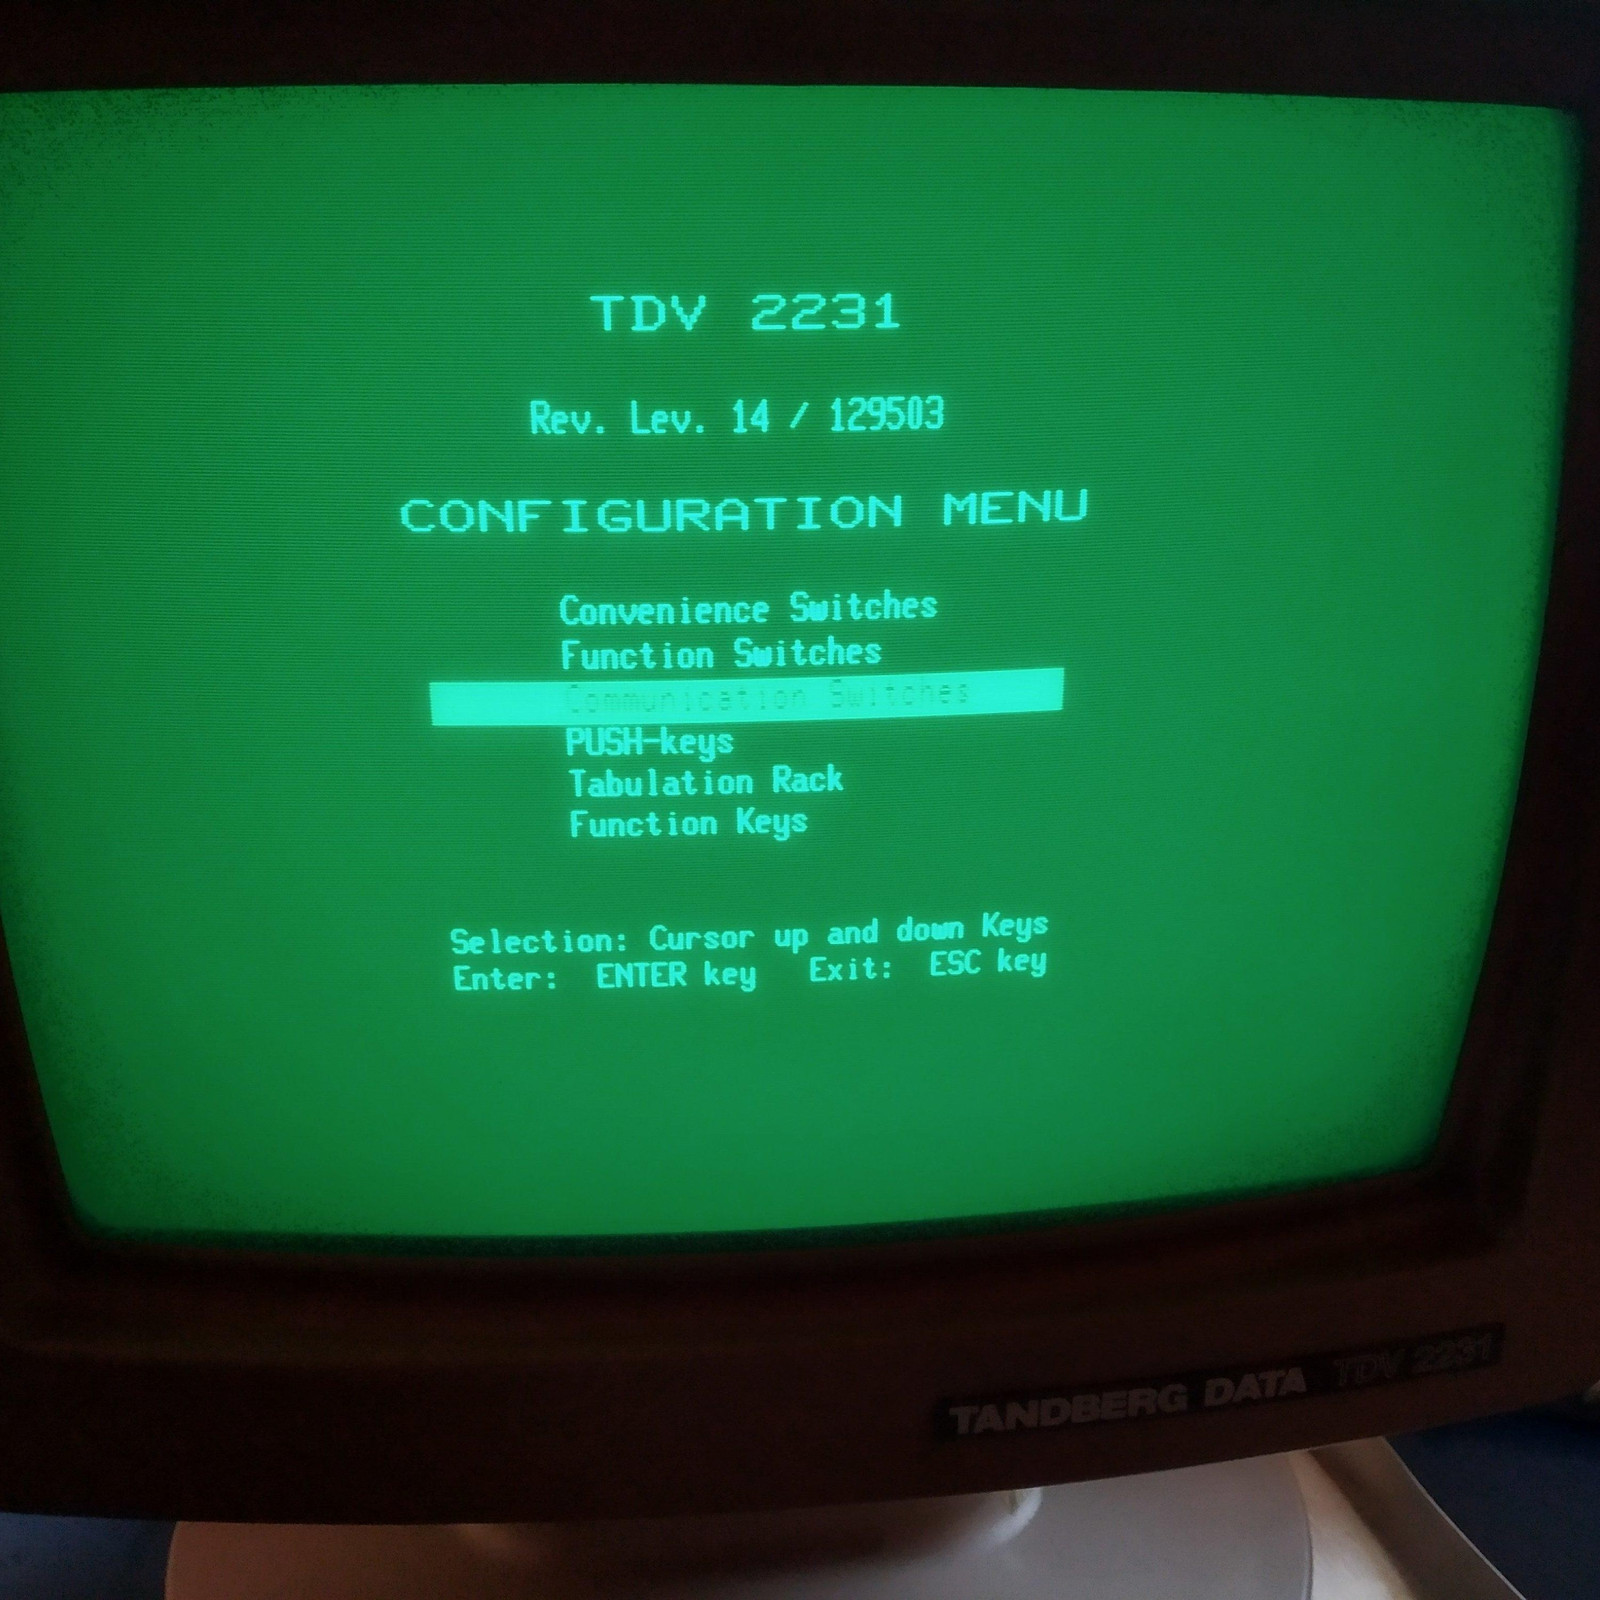 Tandberg Display TDV 5010 | FINN.no